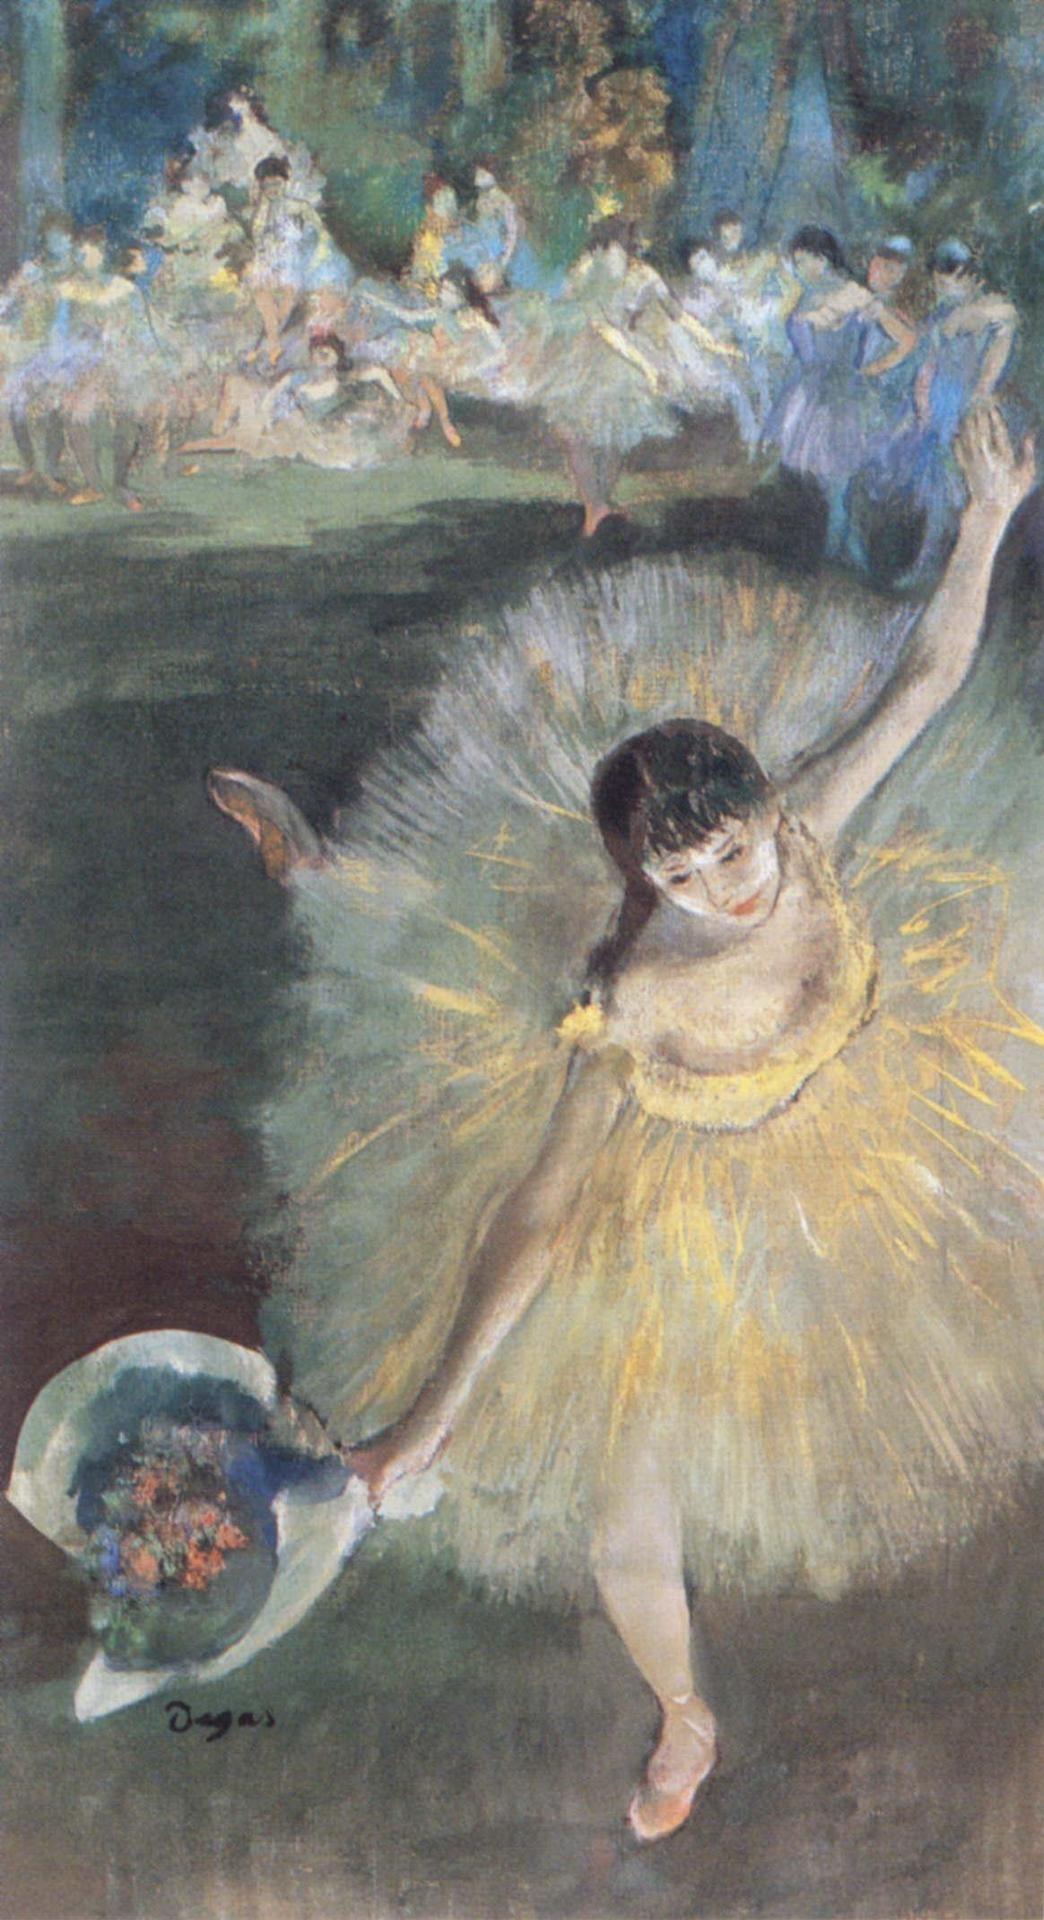 Fin d'Arabesque, ballerina Rosita Mauri (c. 1877). Edgar Degas (French, 1834-1917). Pastel, essence and oil on paper. Paris, Musée d'Orsay.